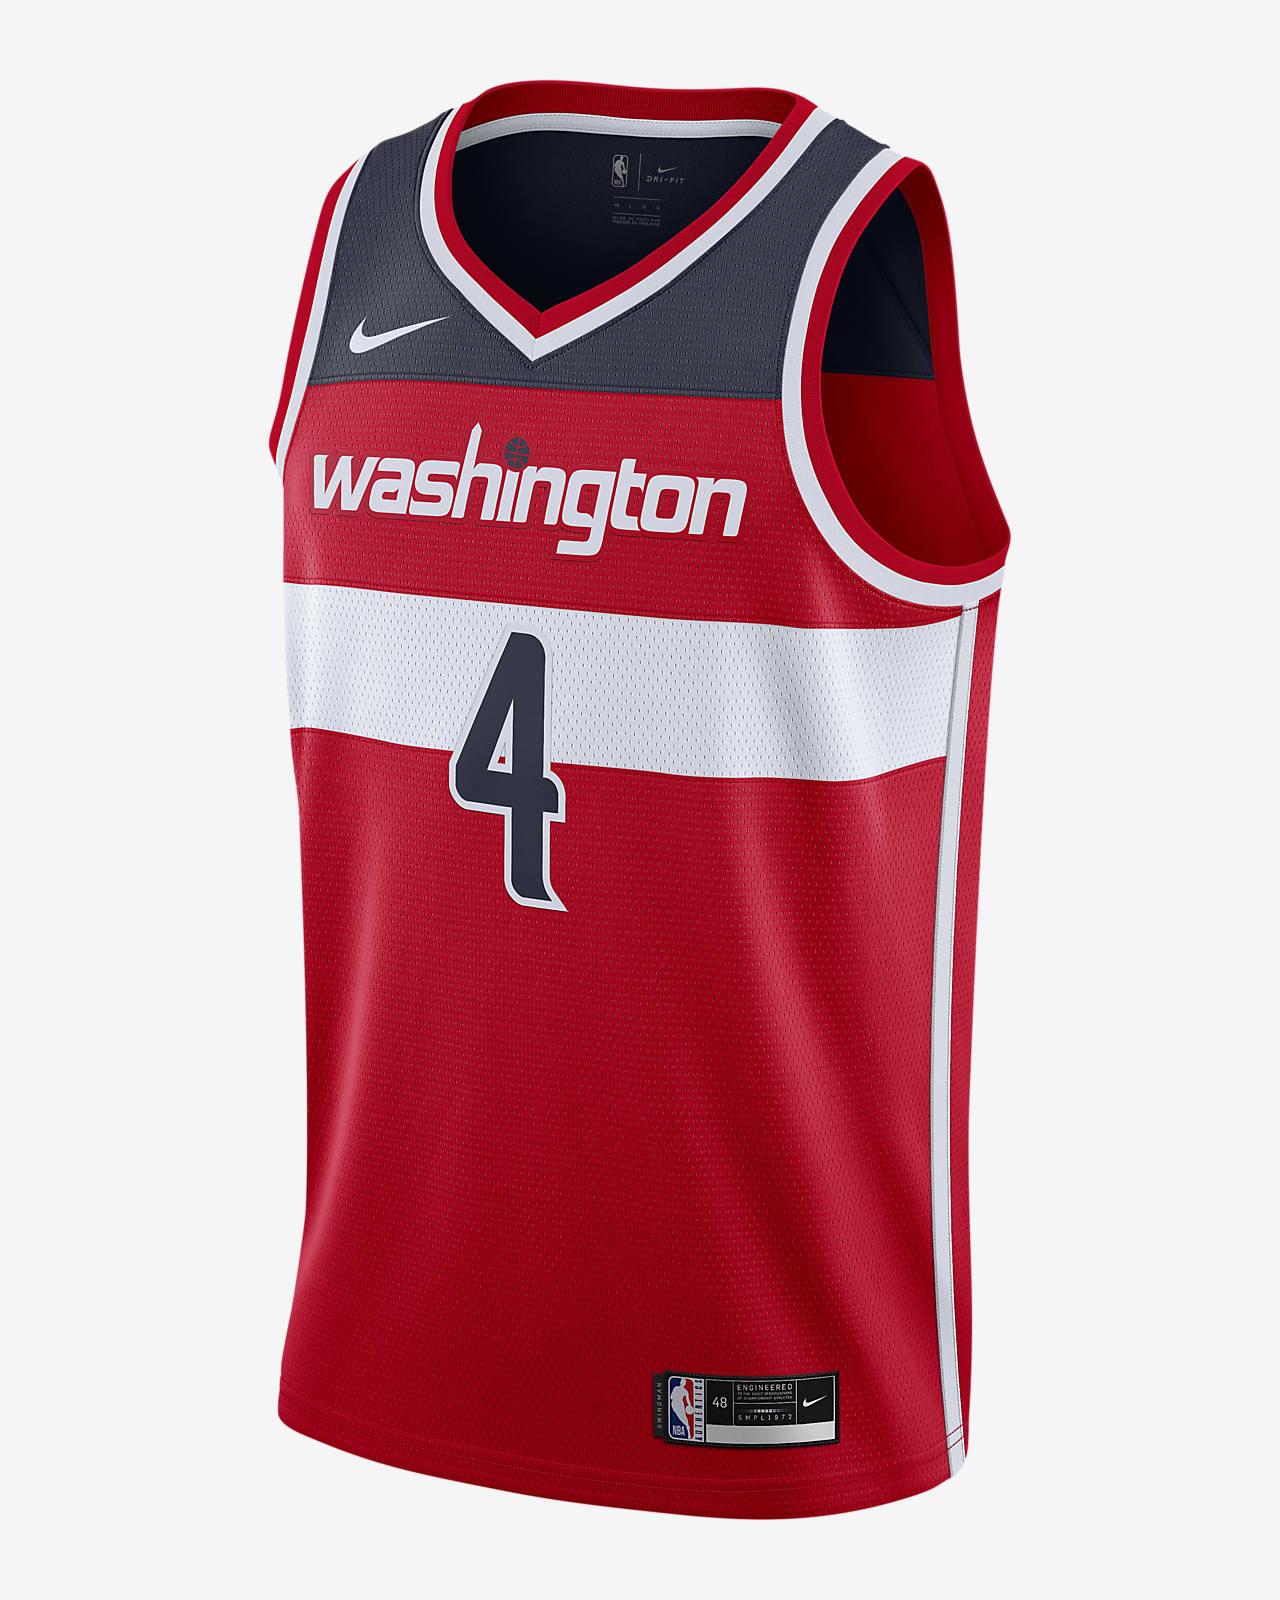 Wizards Icon Edition 2020 Nike NBA Swingman Jersey